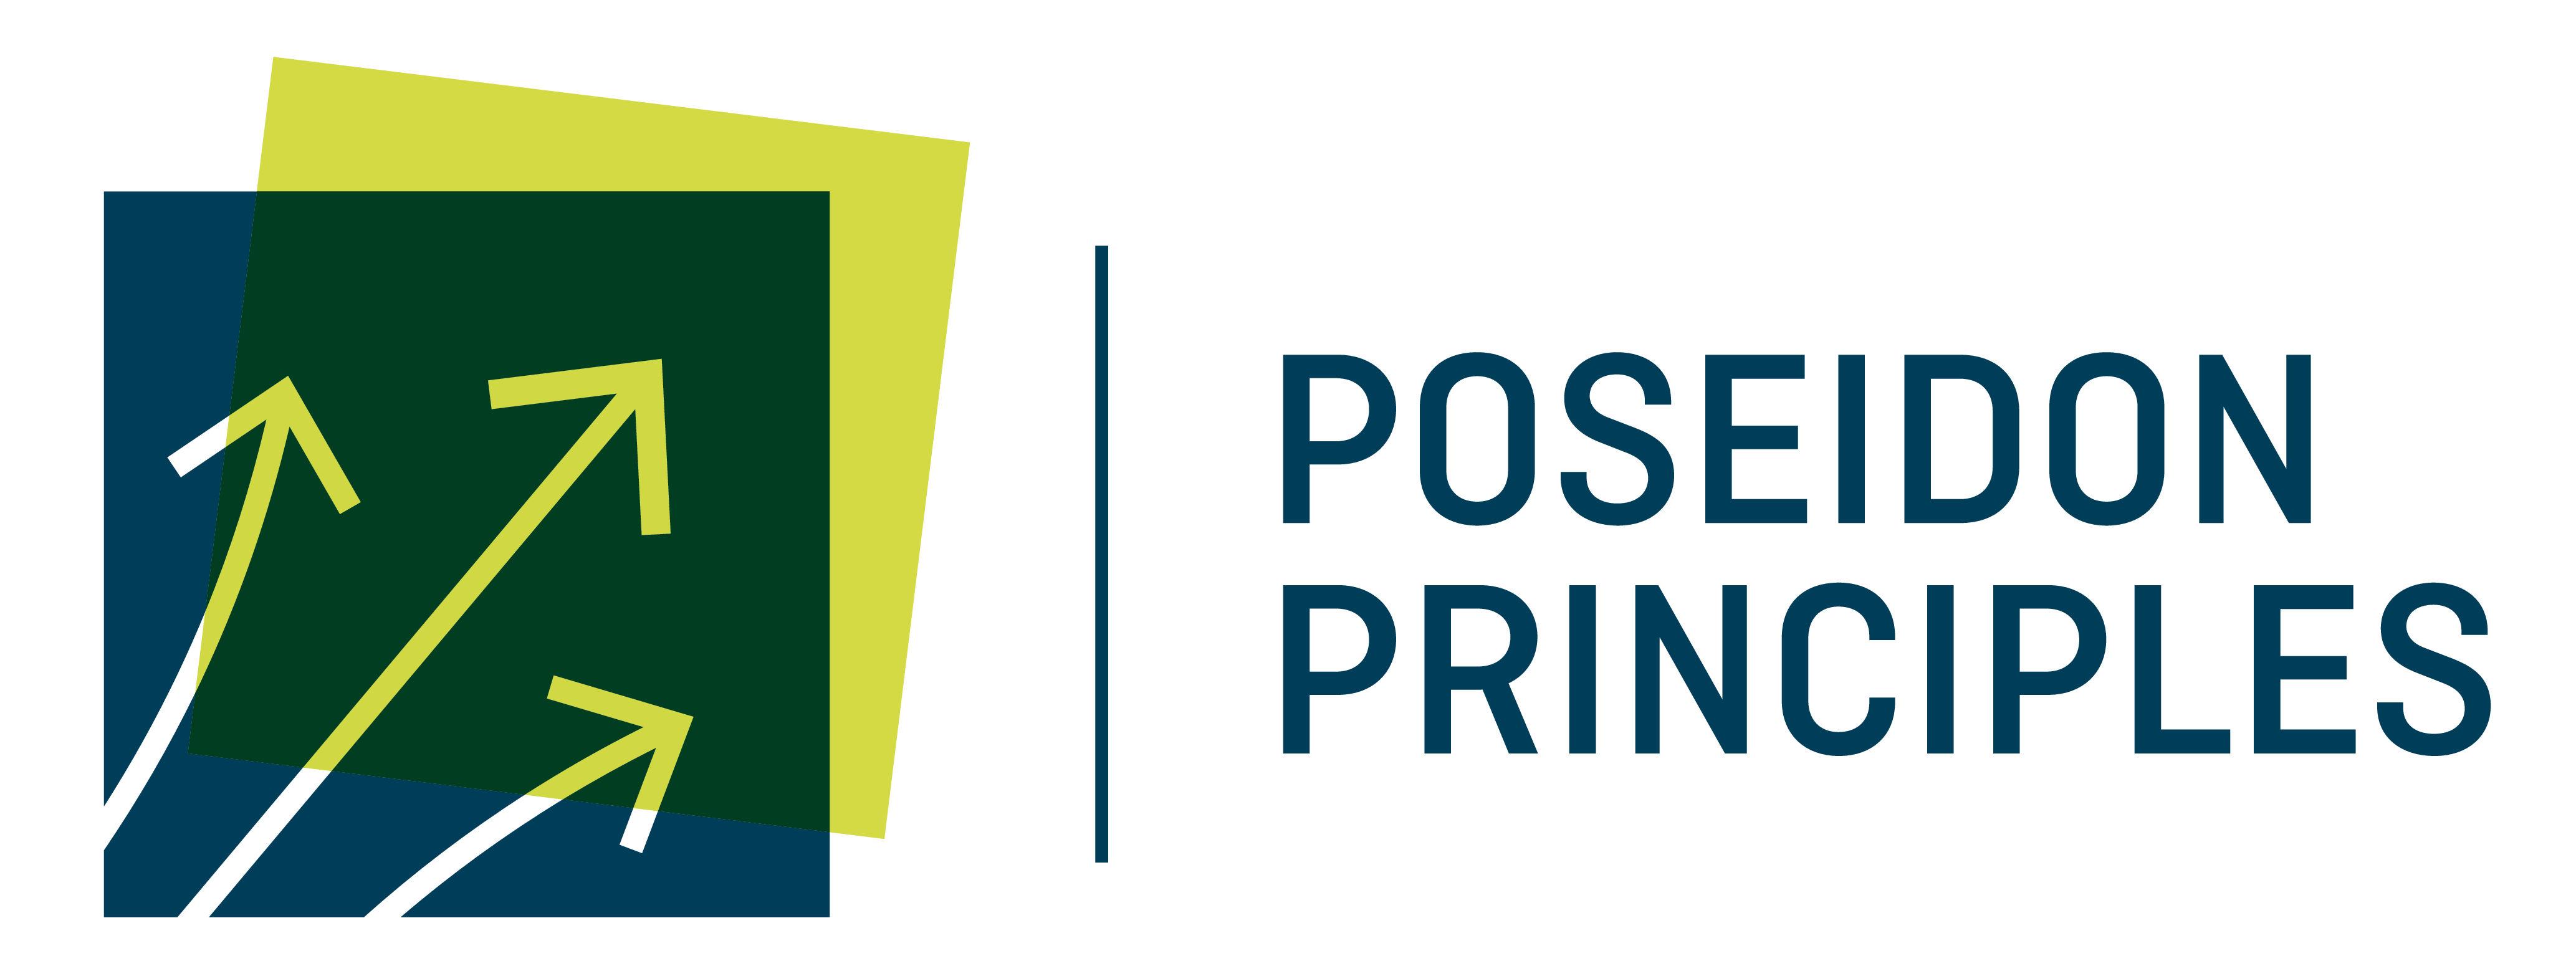 Poseidon Principles